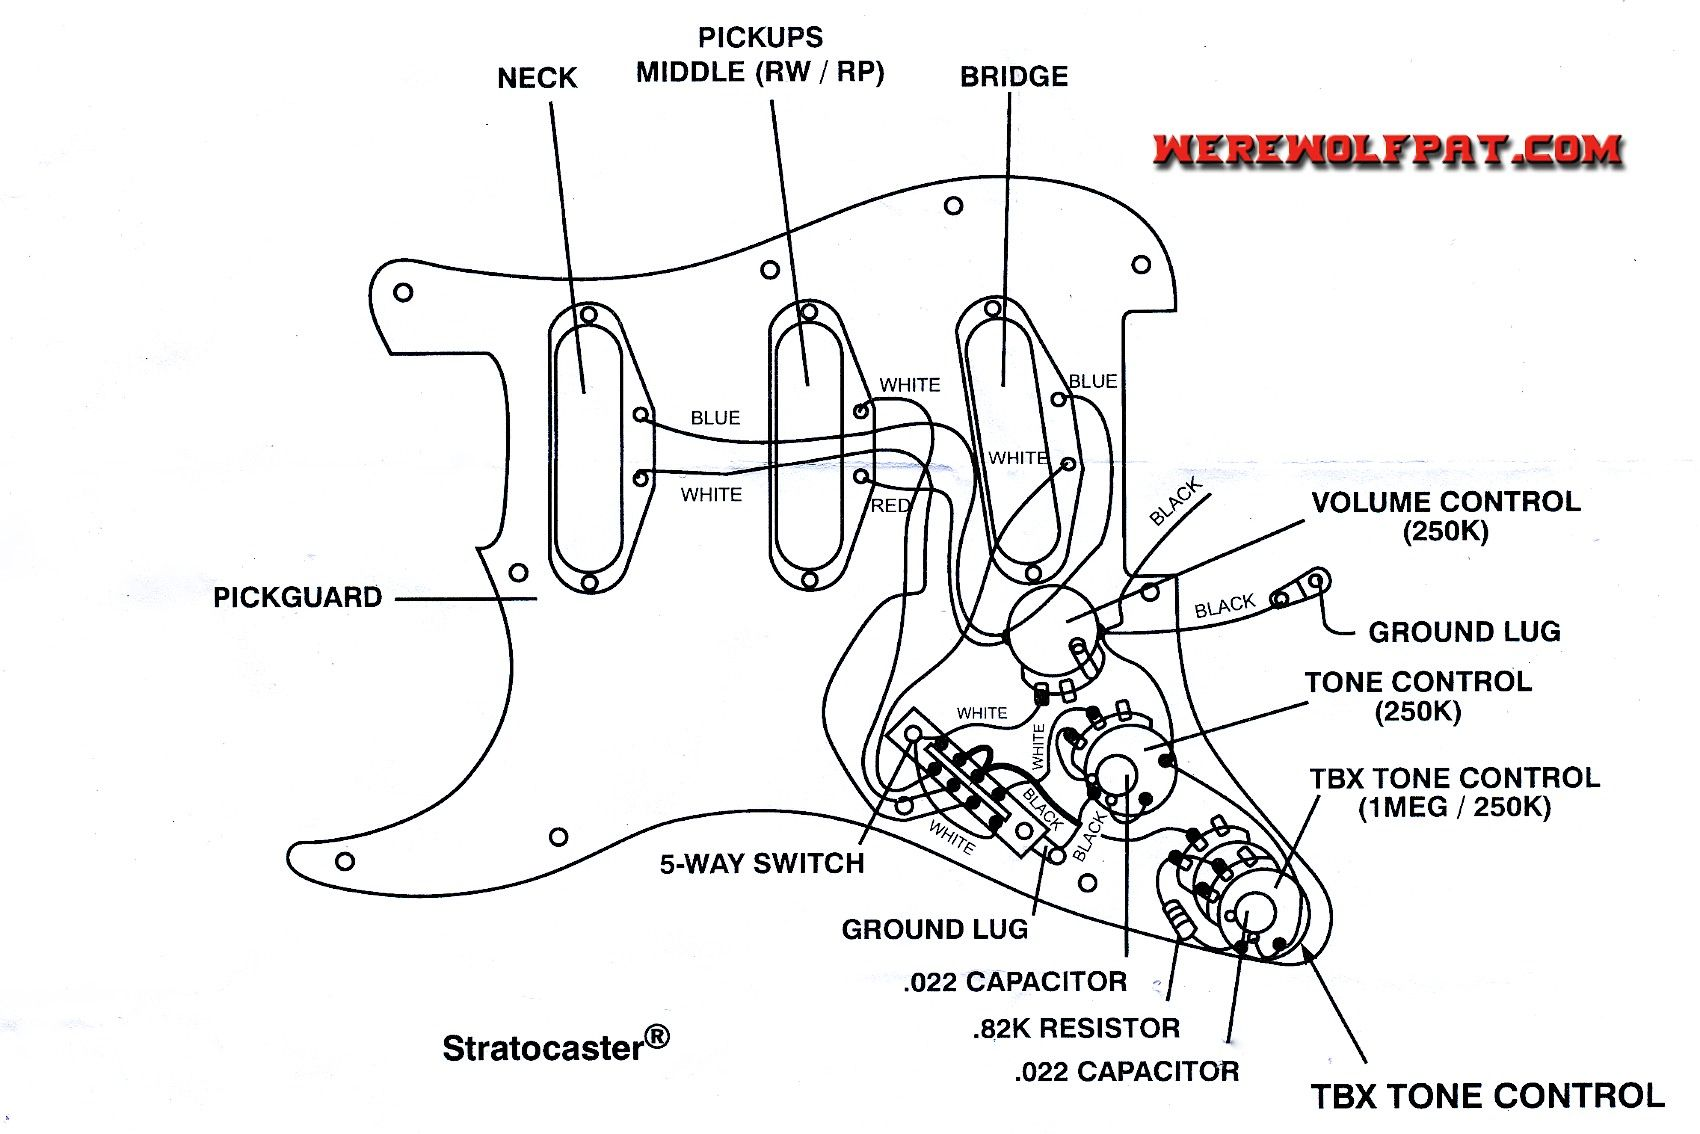 Guitar Pots Wiring Diagram 110cc Electric Diagrams And Schematics In Pictures Blackmilkmedia Com